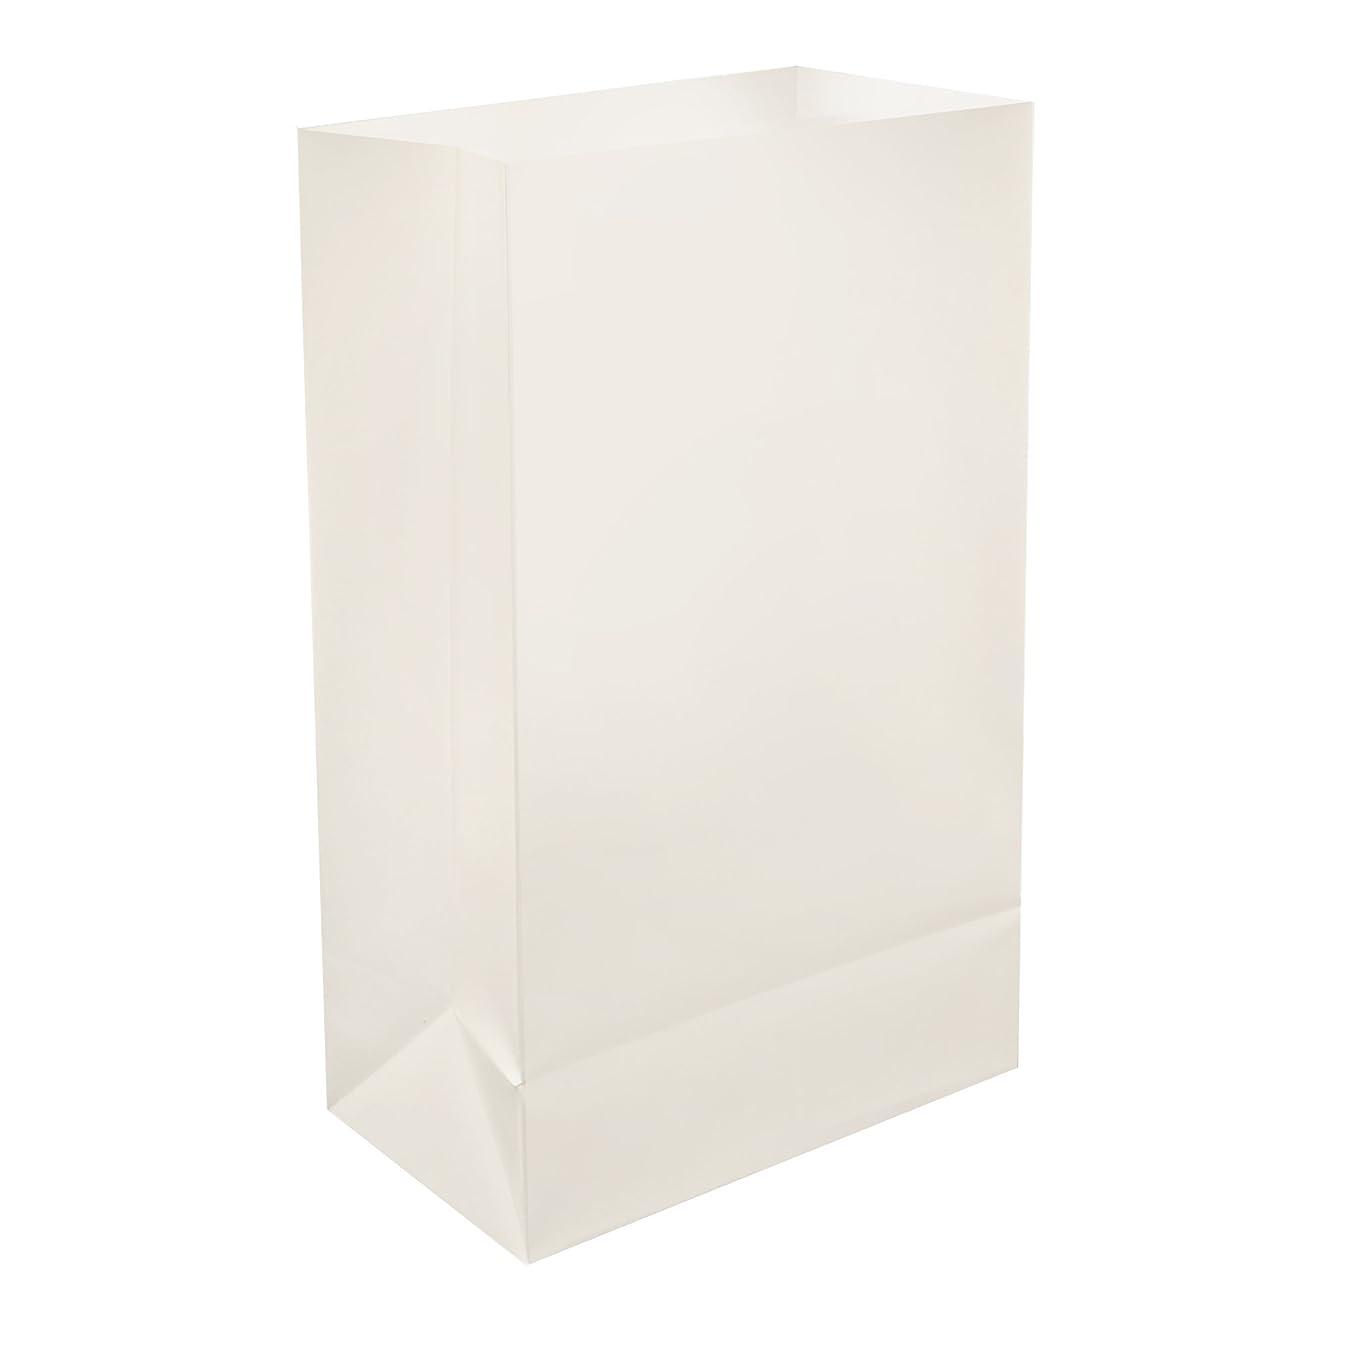 Lumabase 50012 12 Count Plastic Luminaria Bags, White